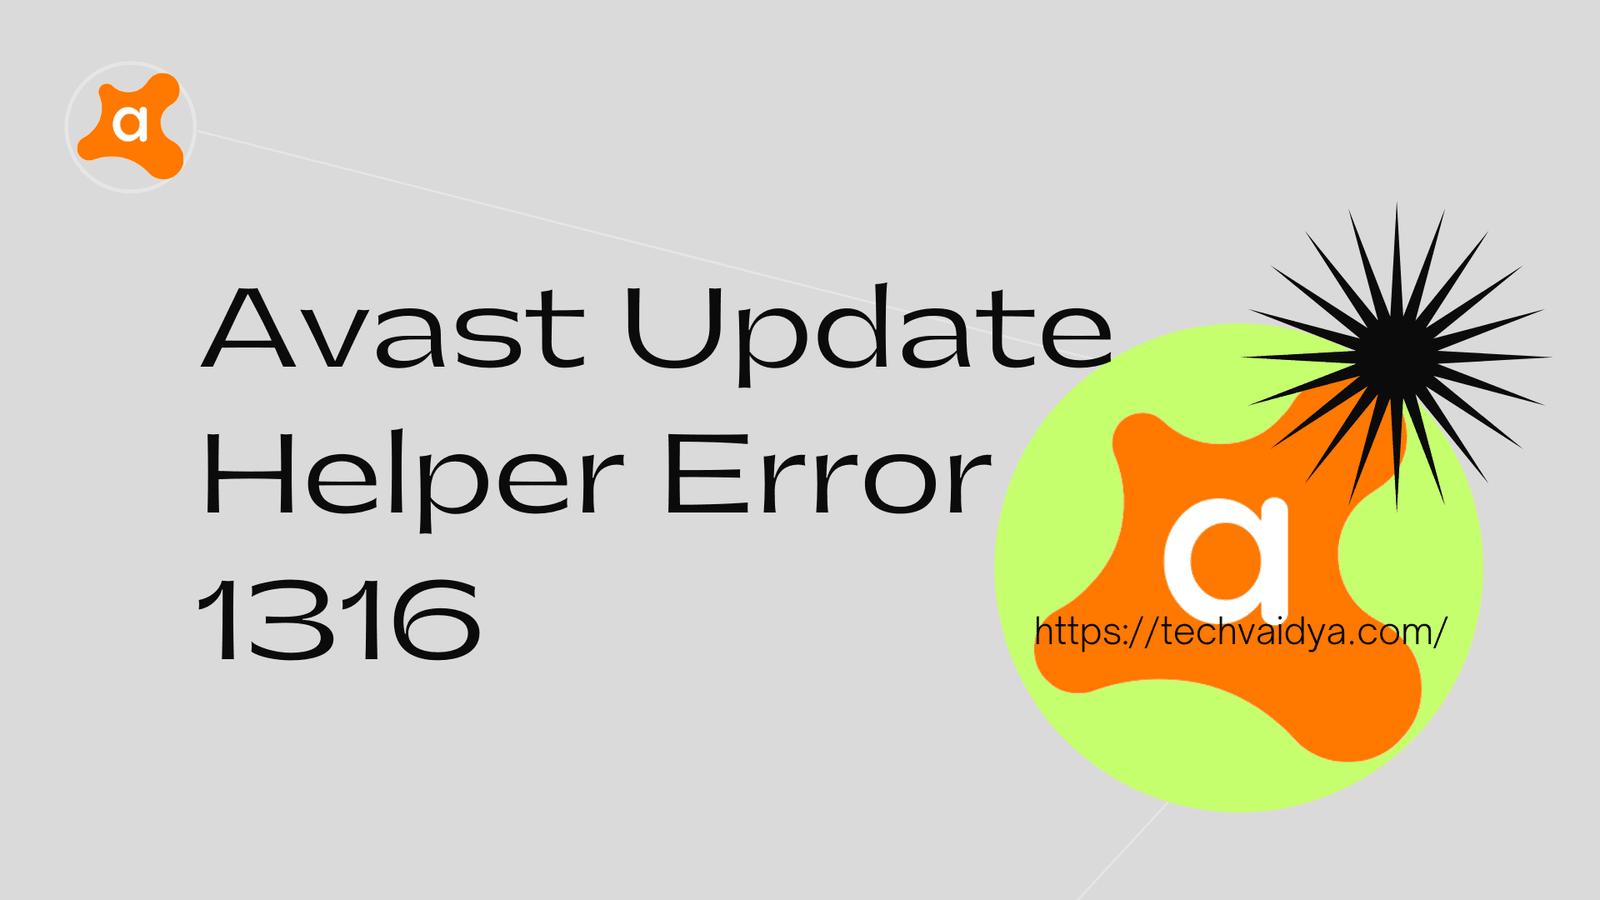 Fix Avast Update Helper Error 1316